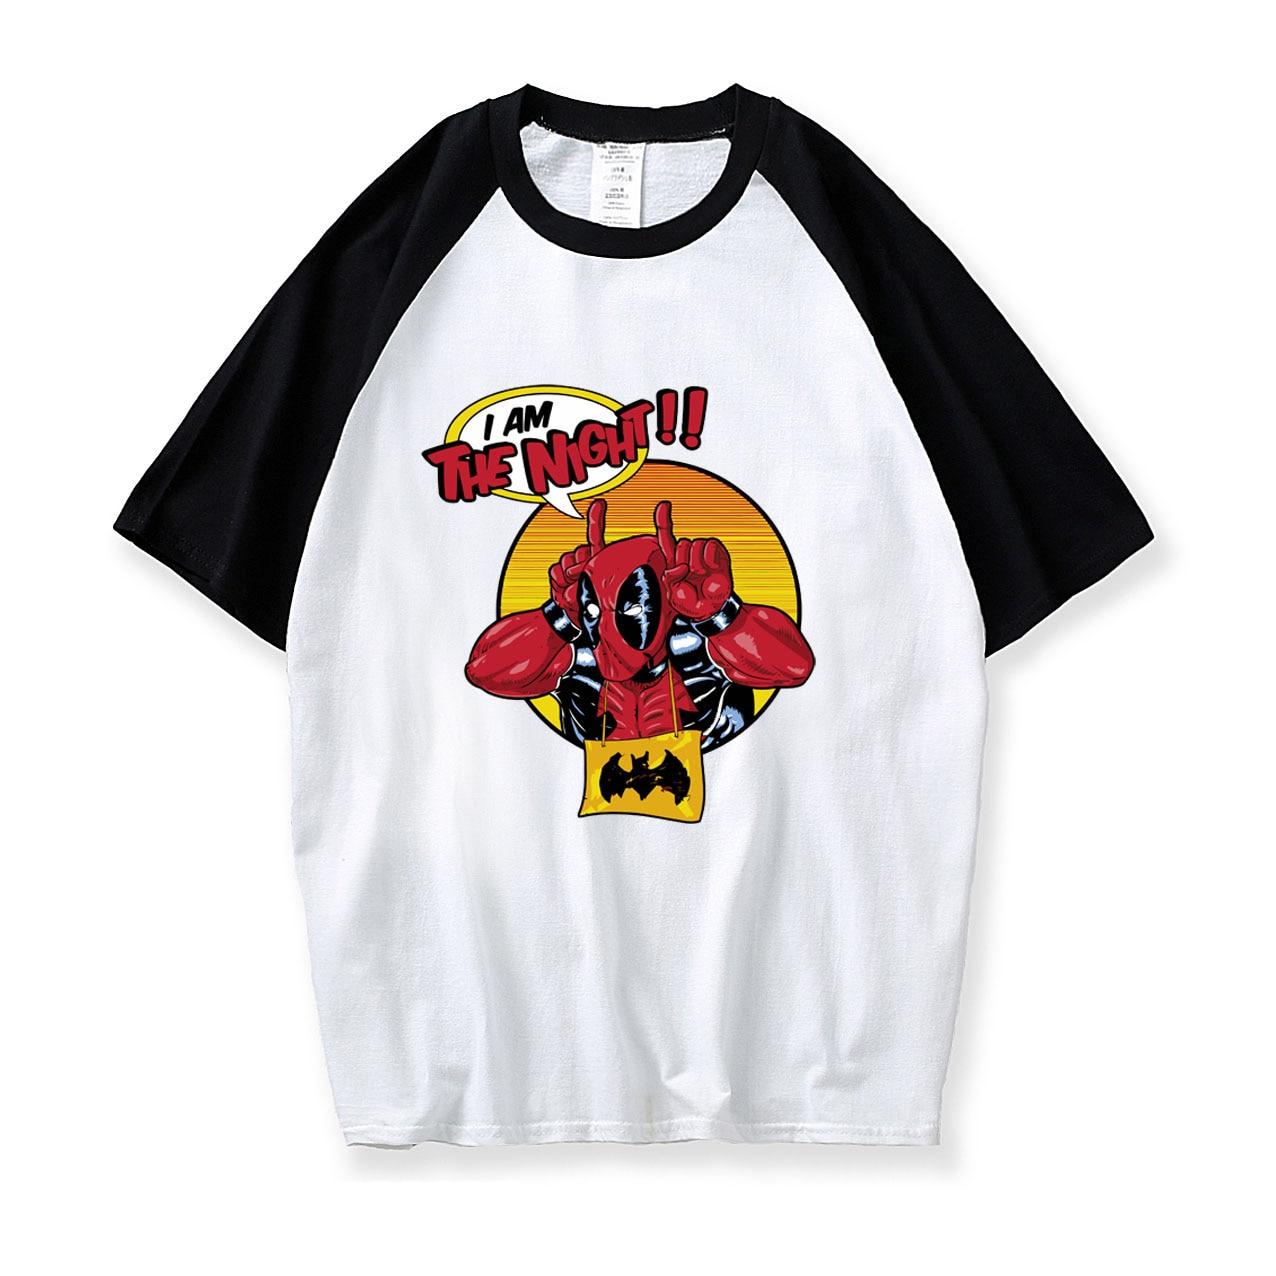 Men Funny o-neck cotton printed T-shirt summer deadpool raglan sleeve T Shirt streetwear harajuku Camisetas 2019 tee shirt homme